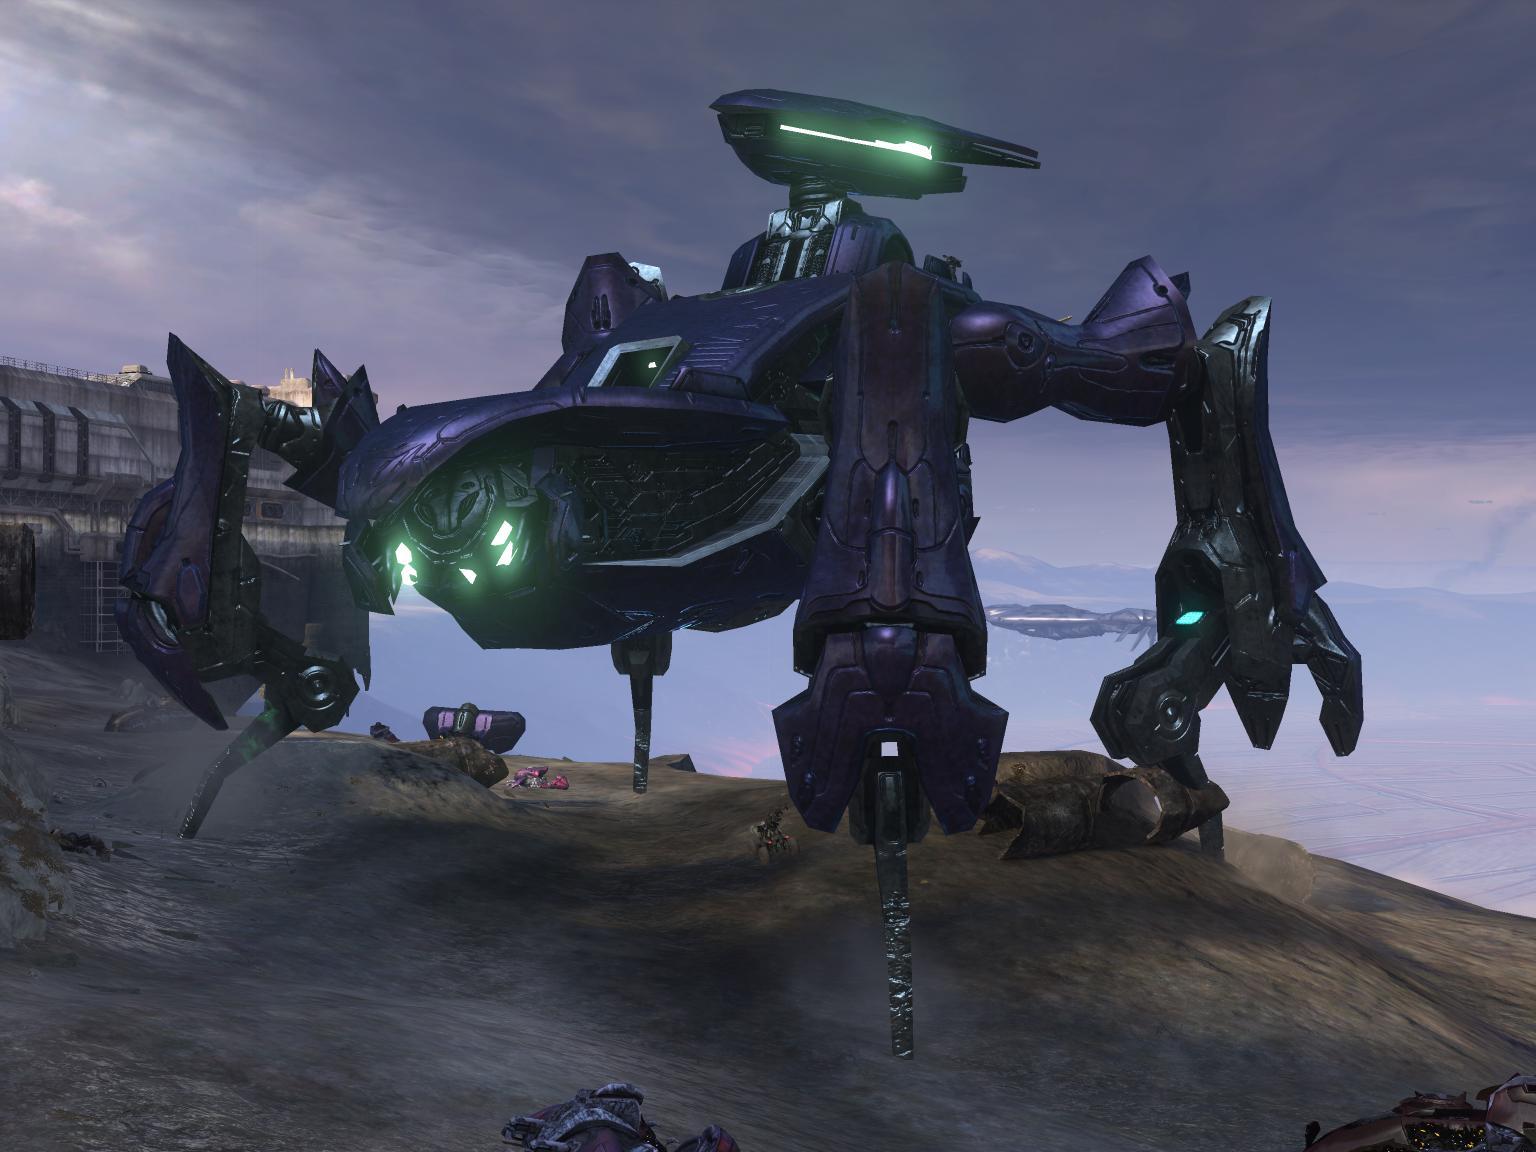 Scarab jpg - Halo Nation     The Halo encyclopedia - Halo 1  Halo 2    Halo 2 Scarab